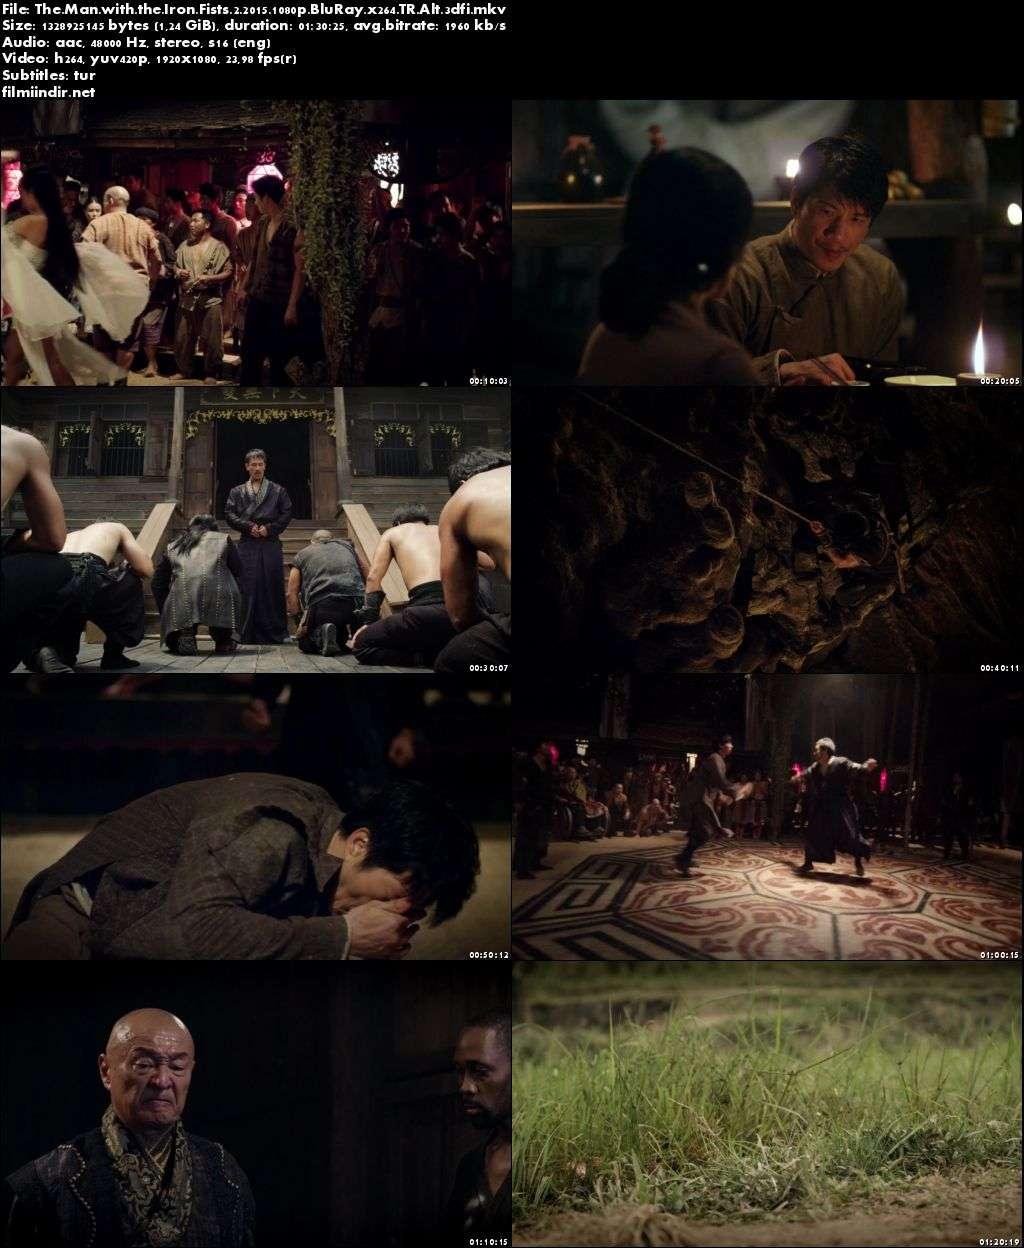 The Man with the Iron Fists 2 (2015) türkçe altyazılı film indir